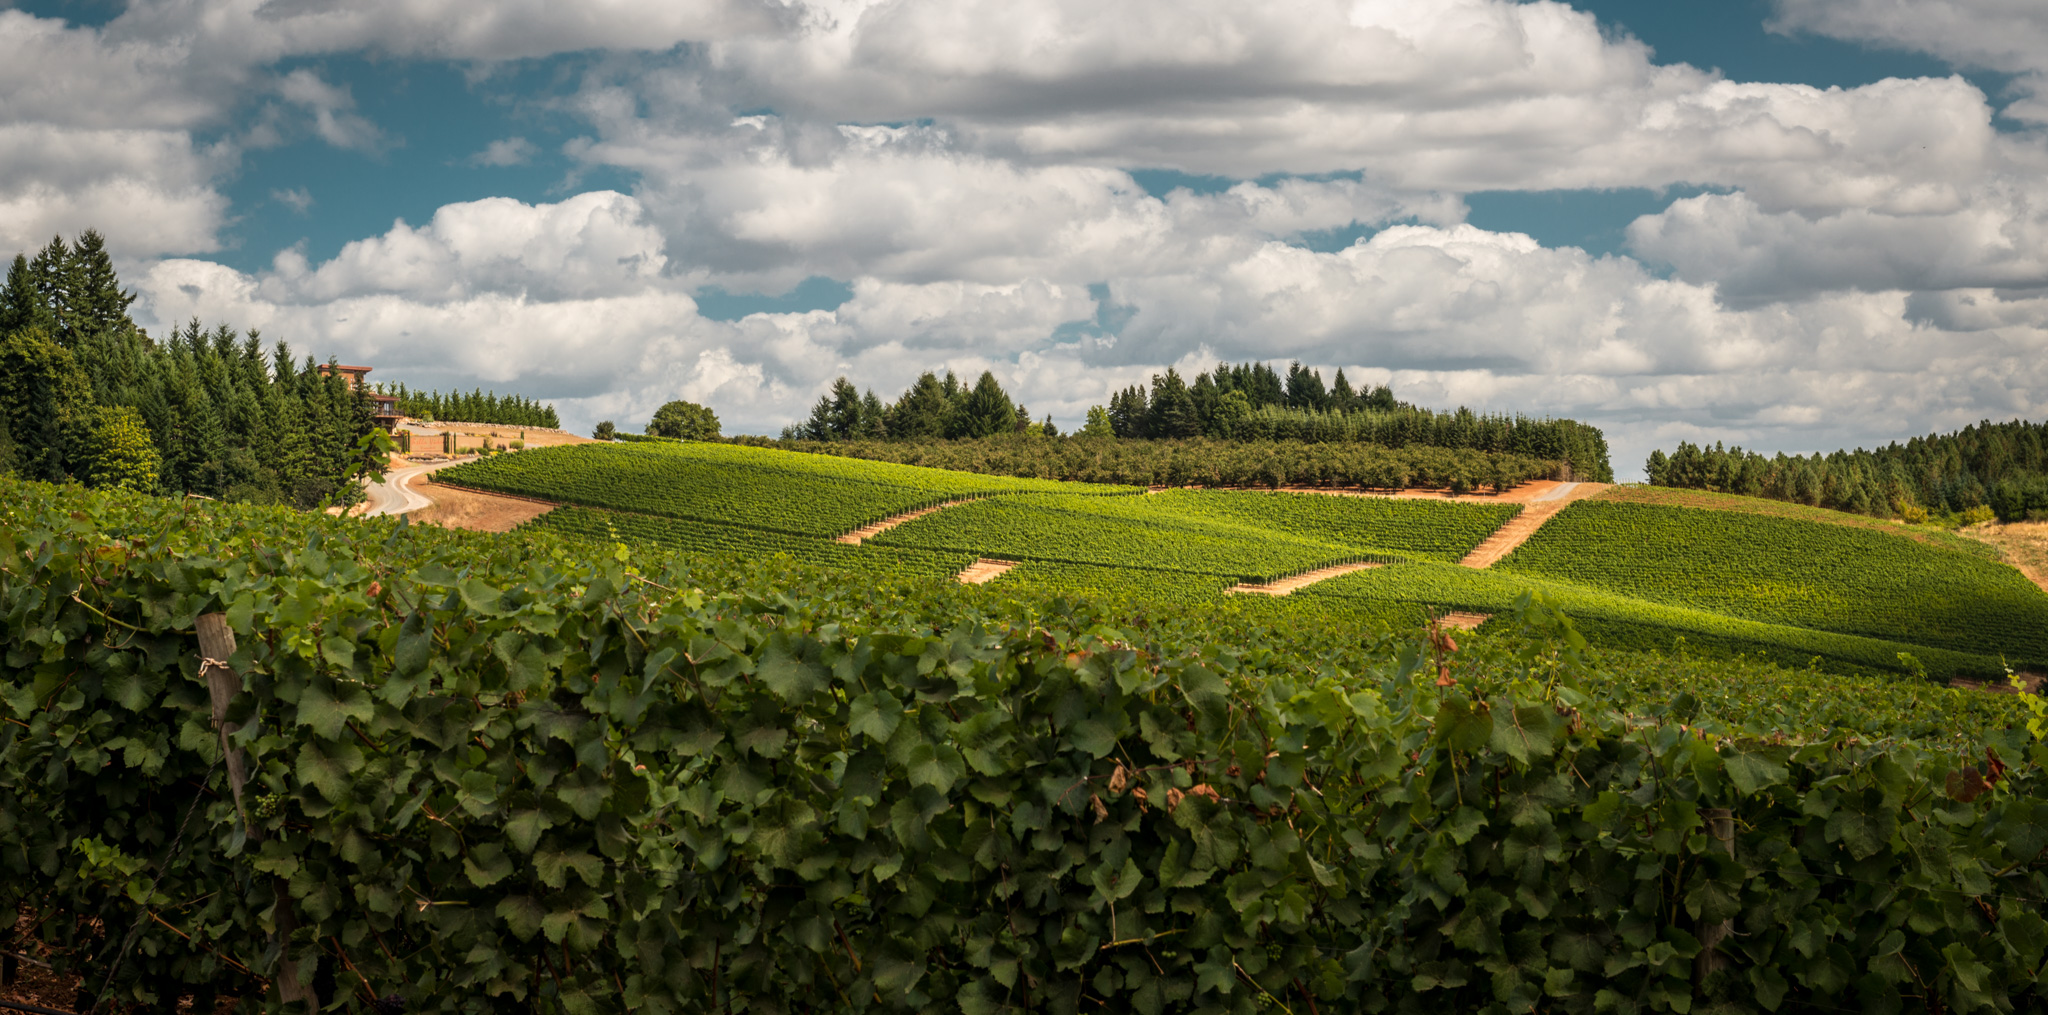 US : Oregon : Vineyards surrounding Erath in the Dundee Hills AVA